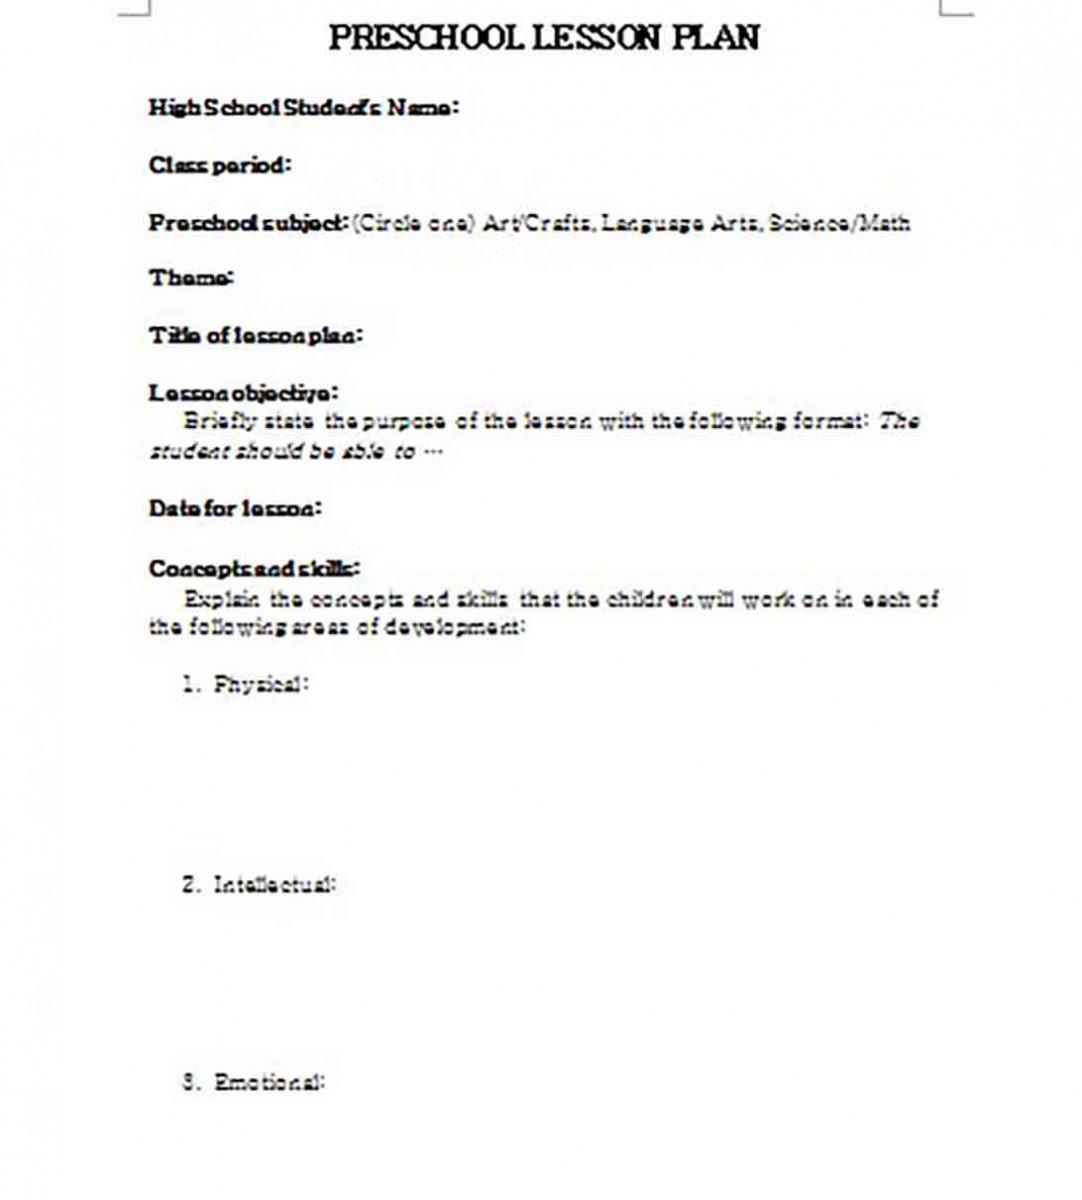 Preschool Lesson Plan templates Word